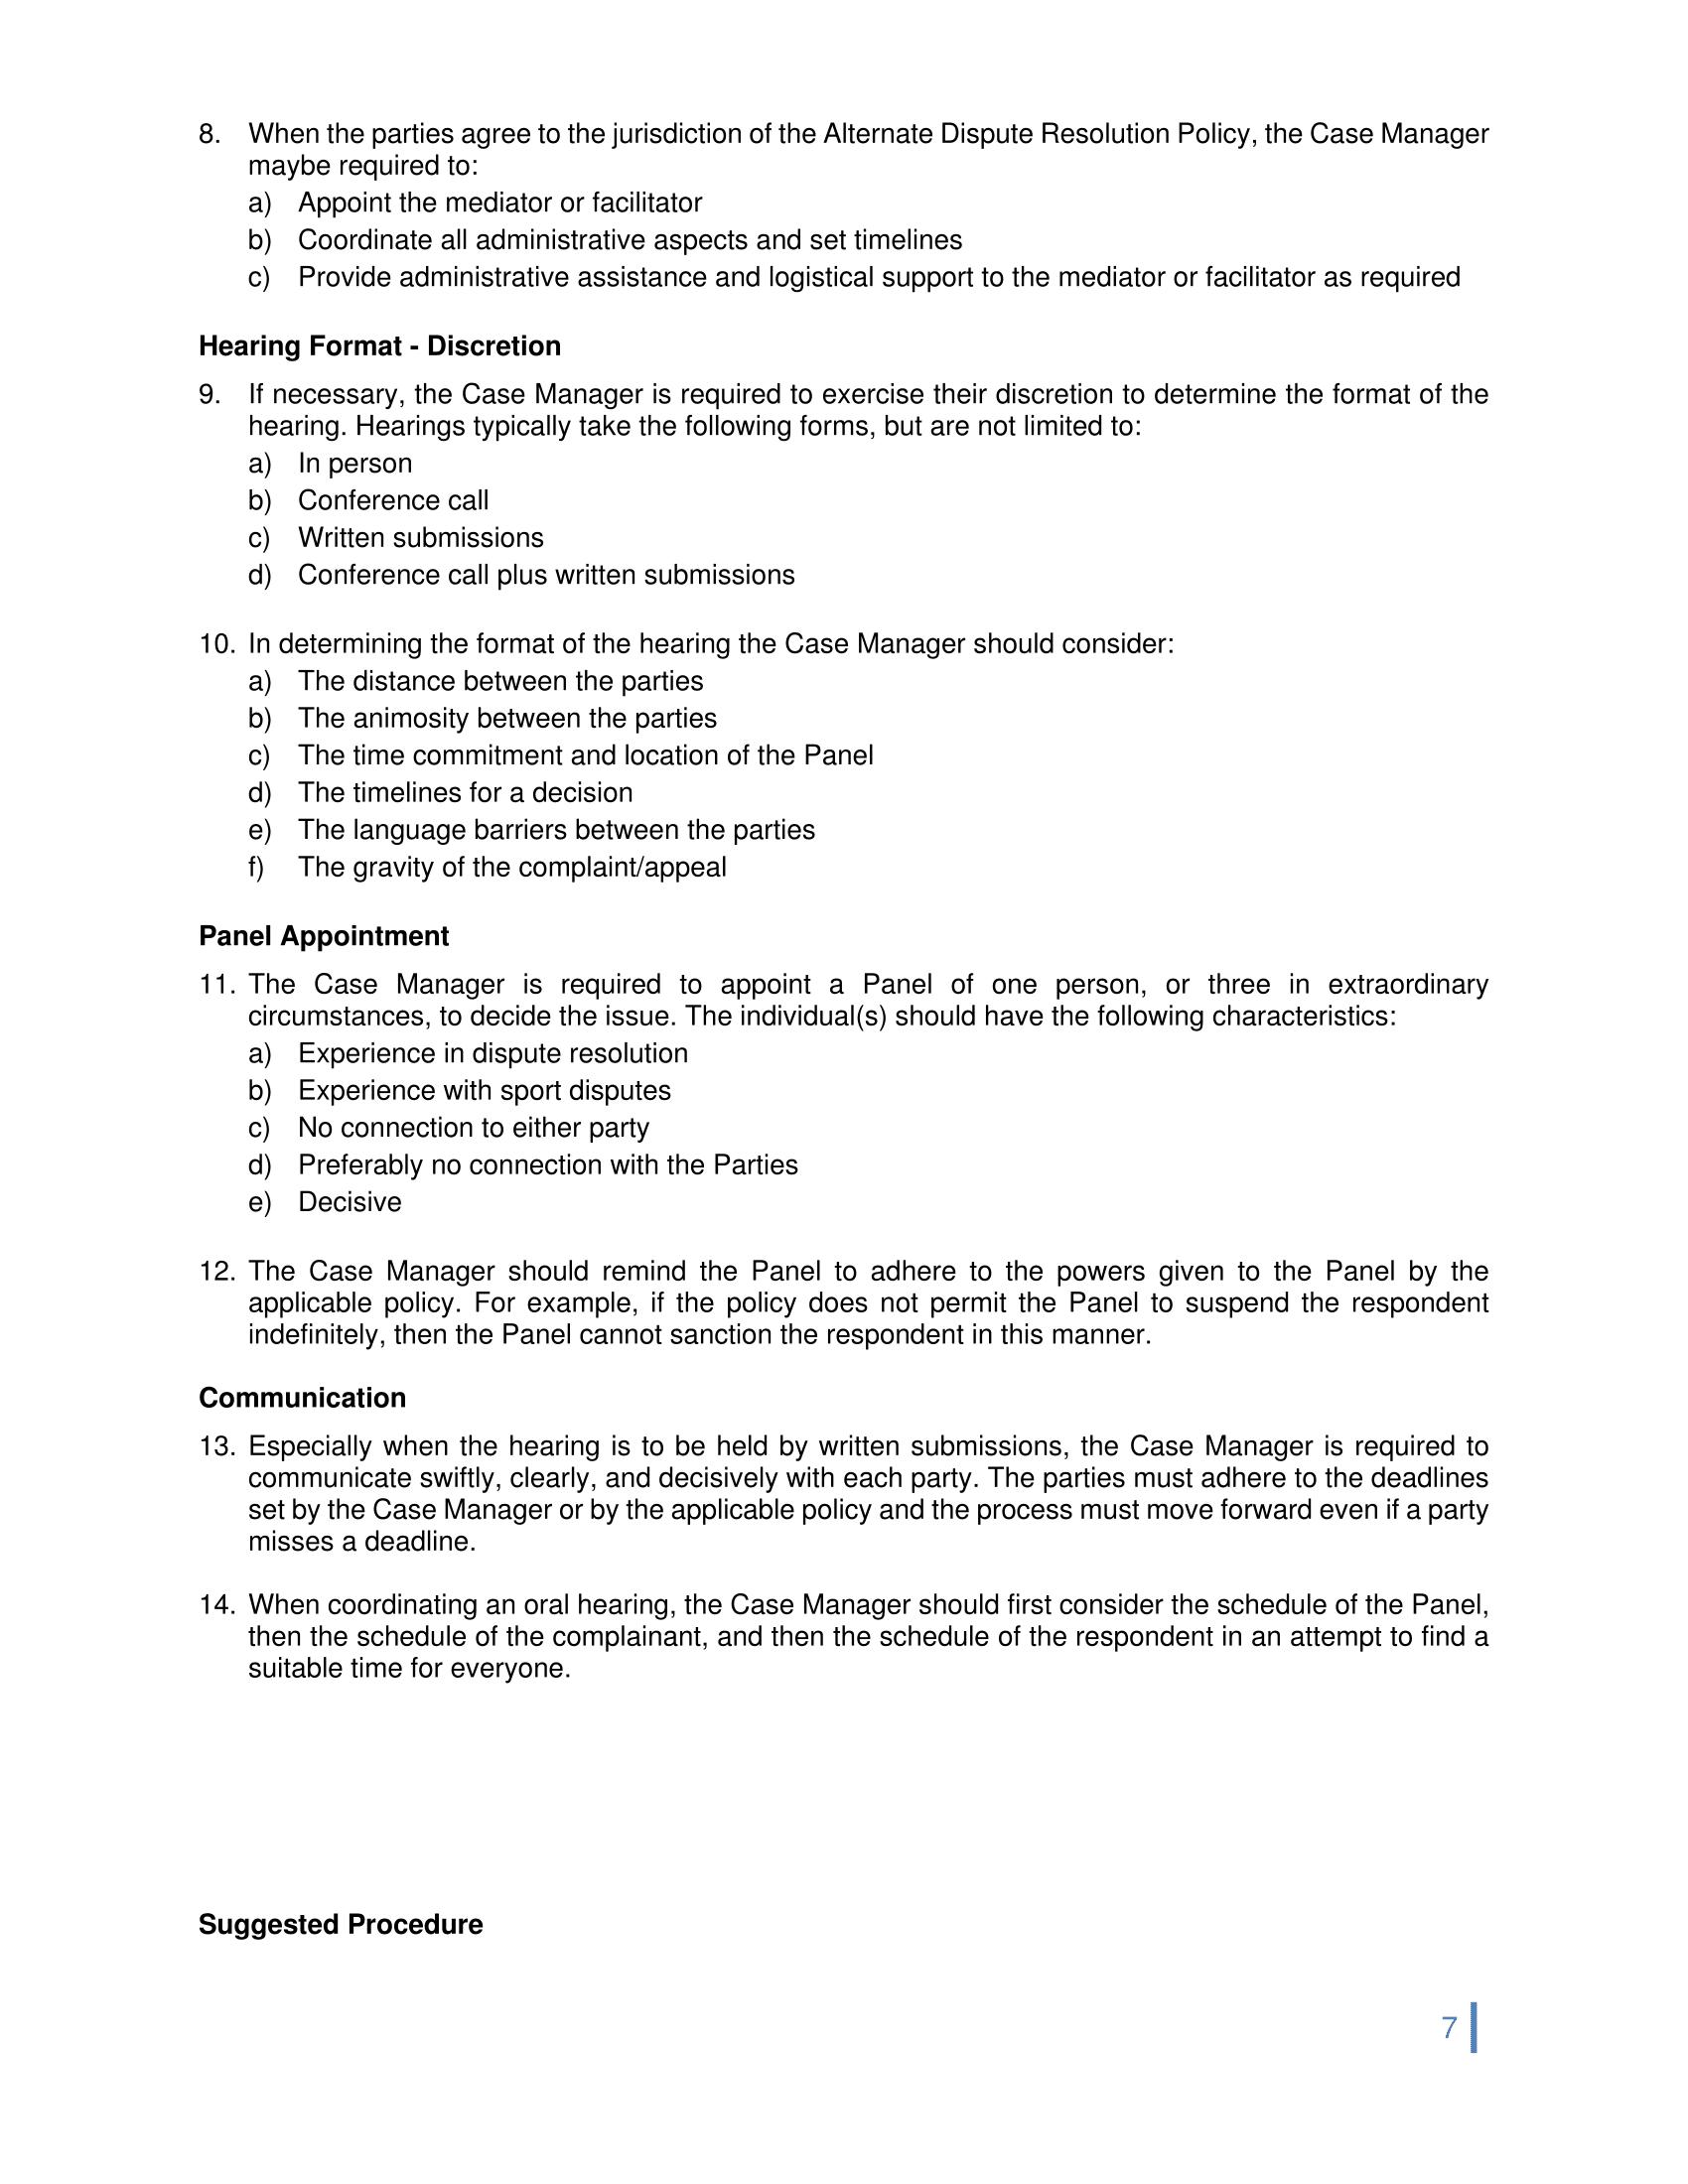 football_saskatchewan_dispute_resolution_policies_and_procedures 18png